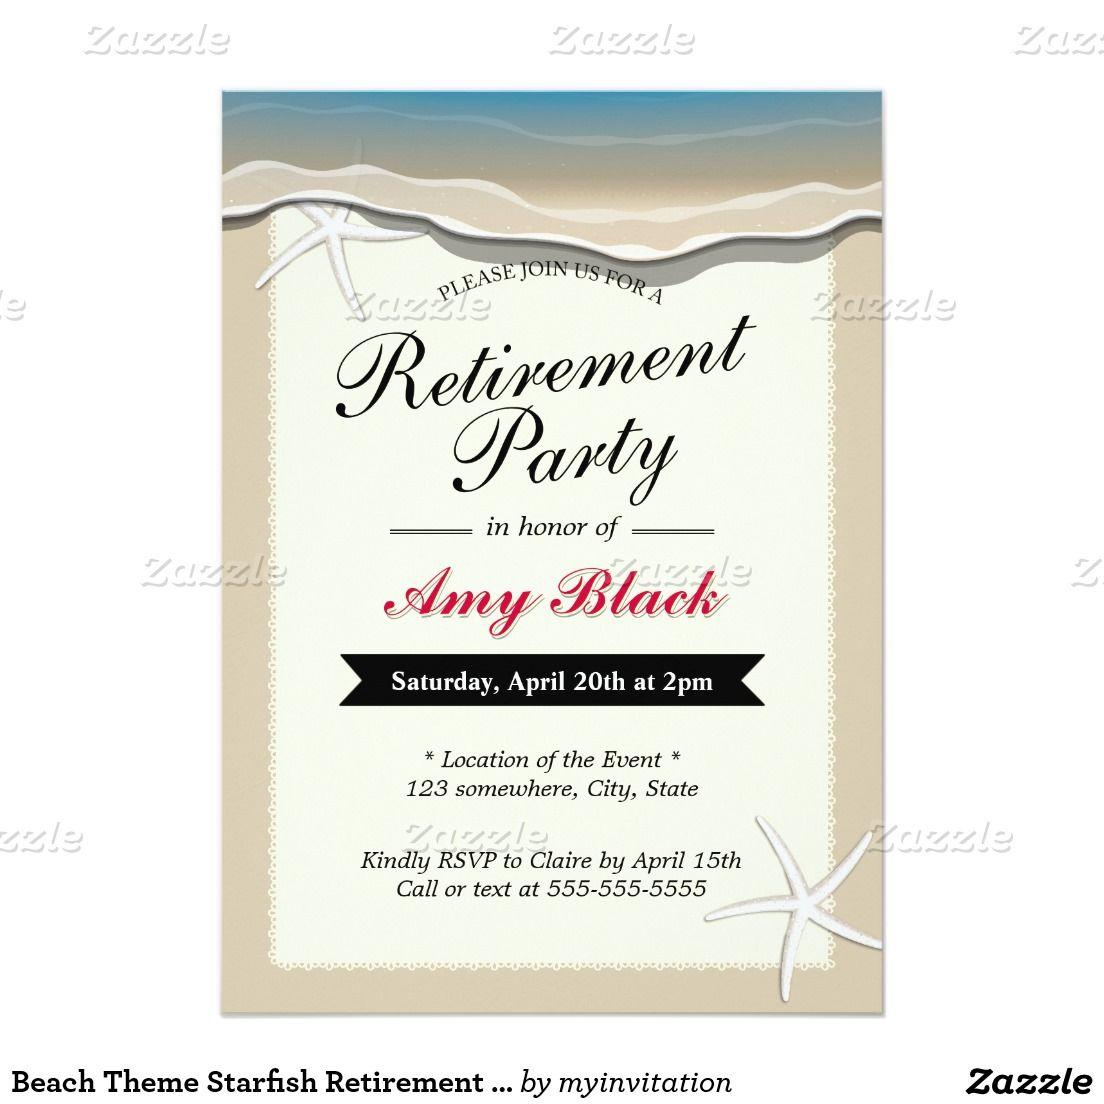 Beach Theme Starfish Retirement Party Invitation | Retirement ...